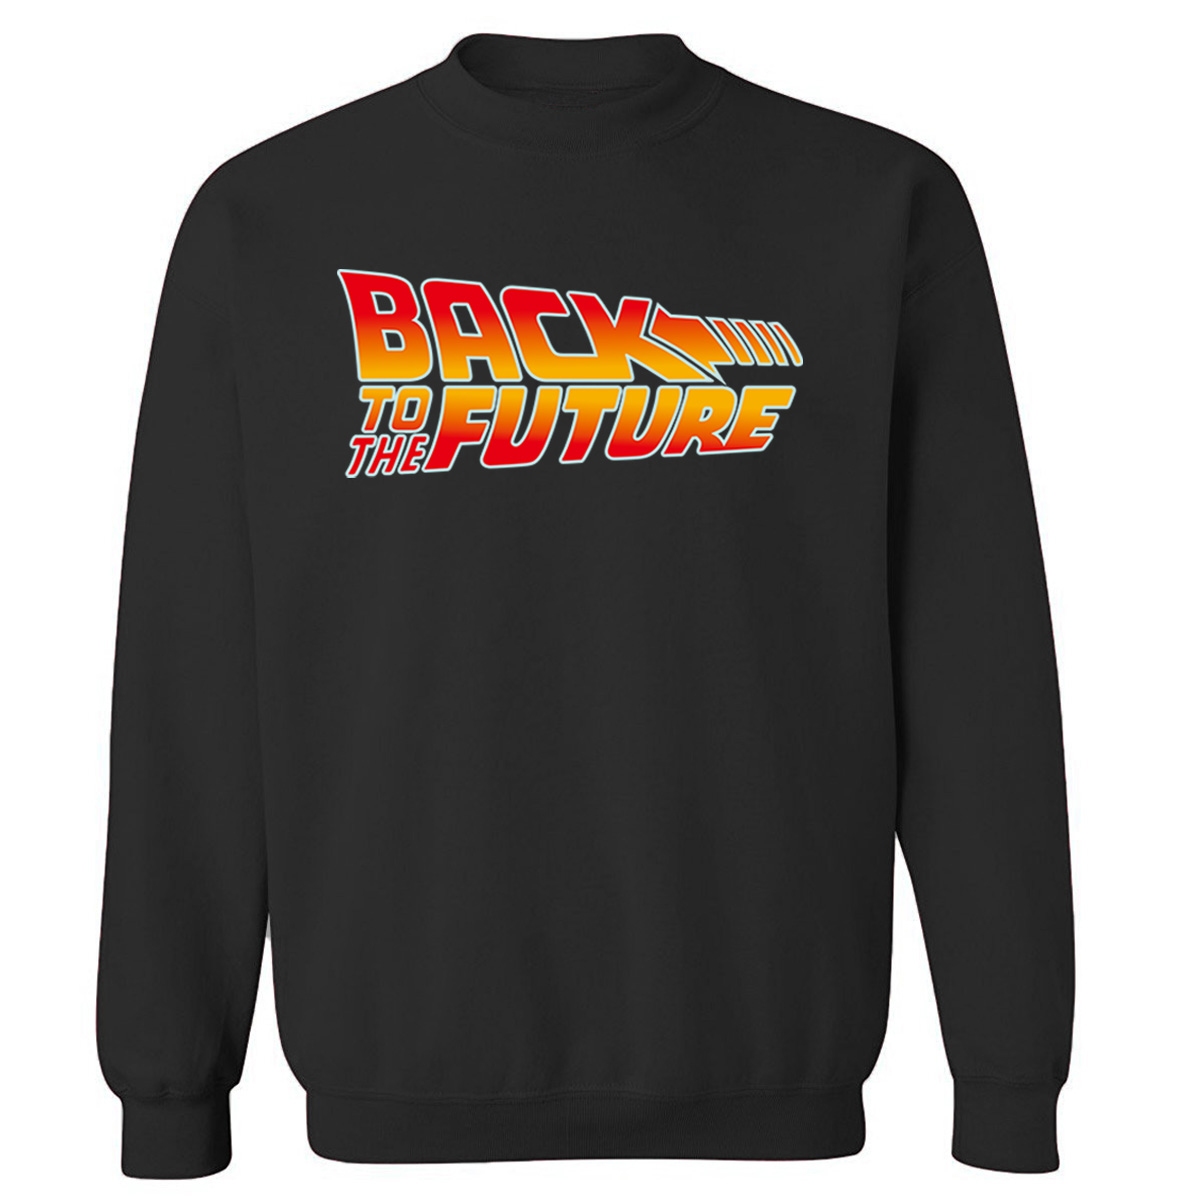 Back To The Future Sweatshirt Men 2019 Autumn Winter Fleece Pullovers O-Neck Brand Clothing Movie Series Mens Sweatshirts Hoodie